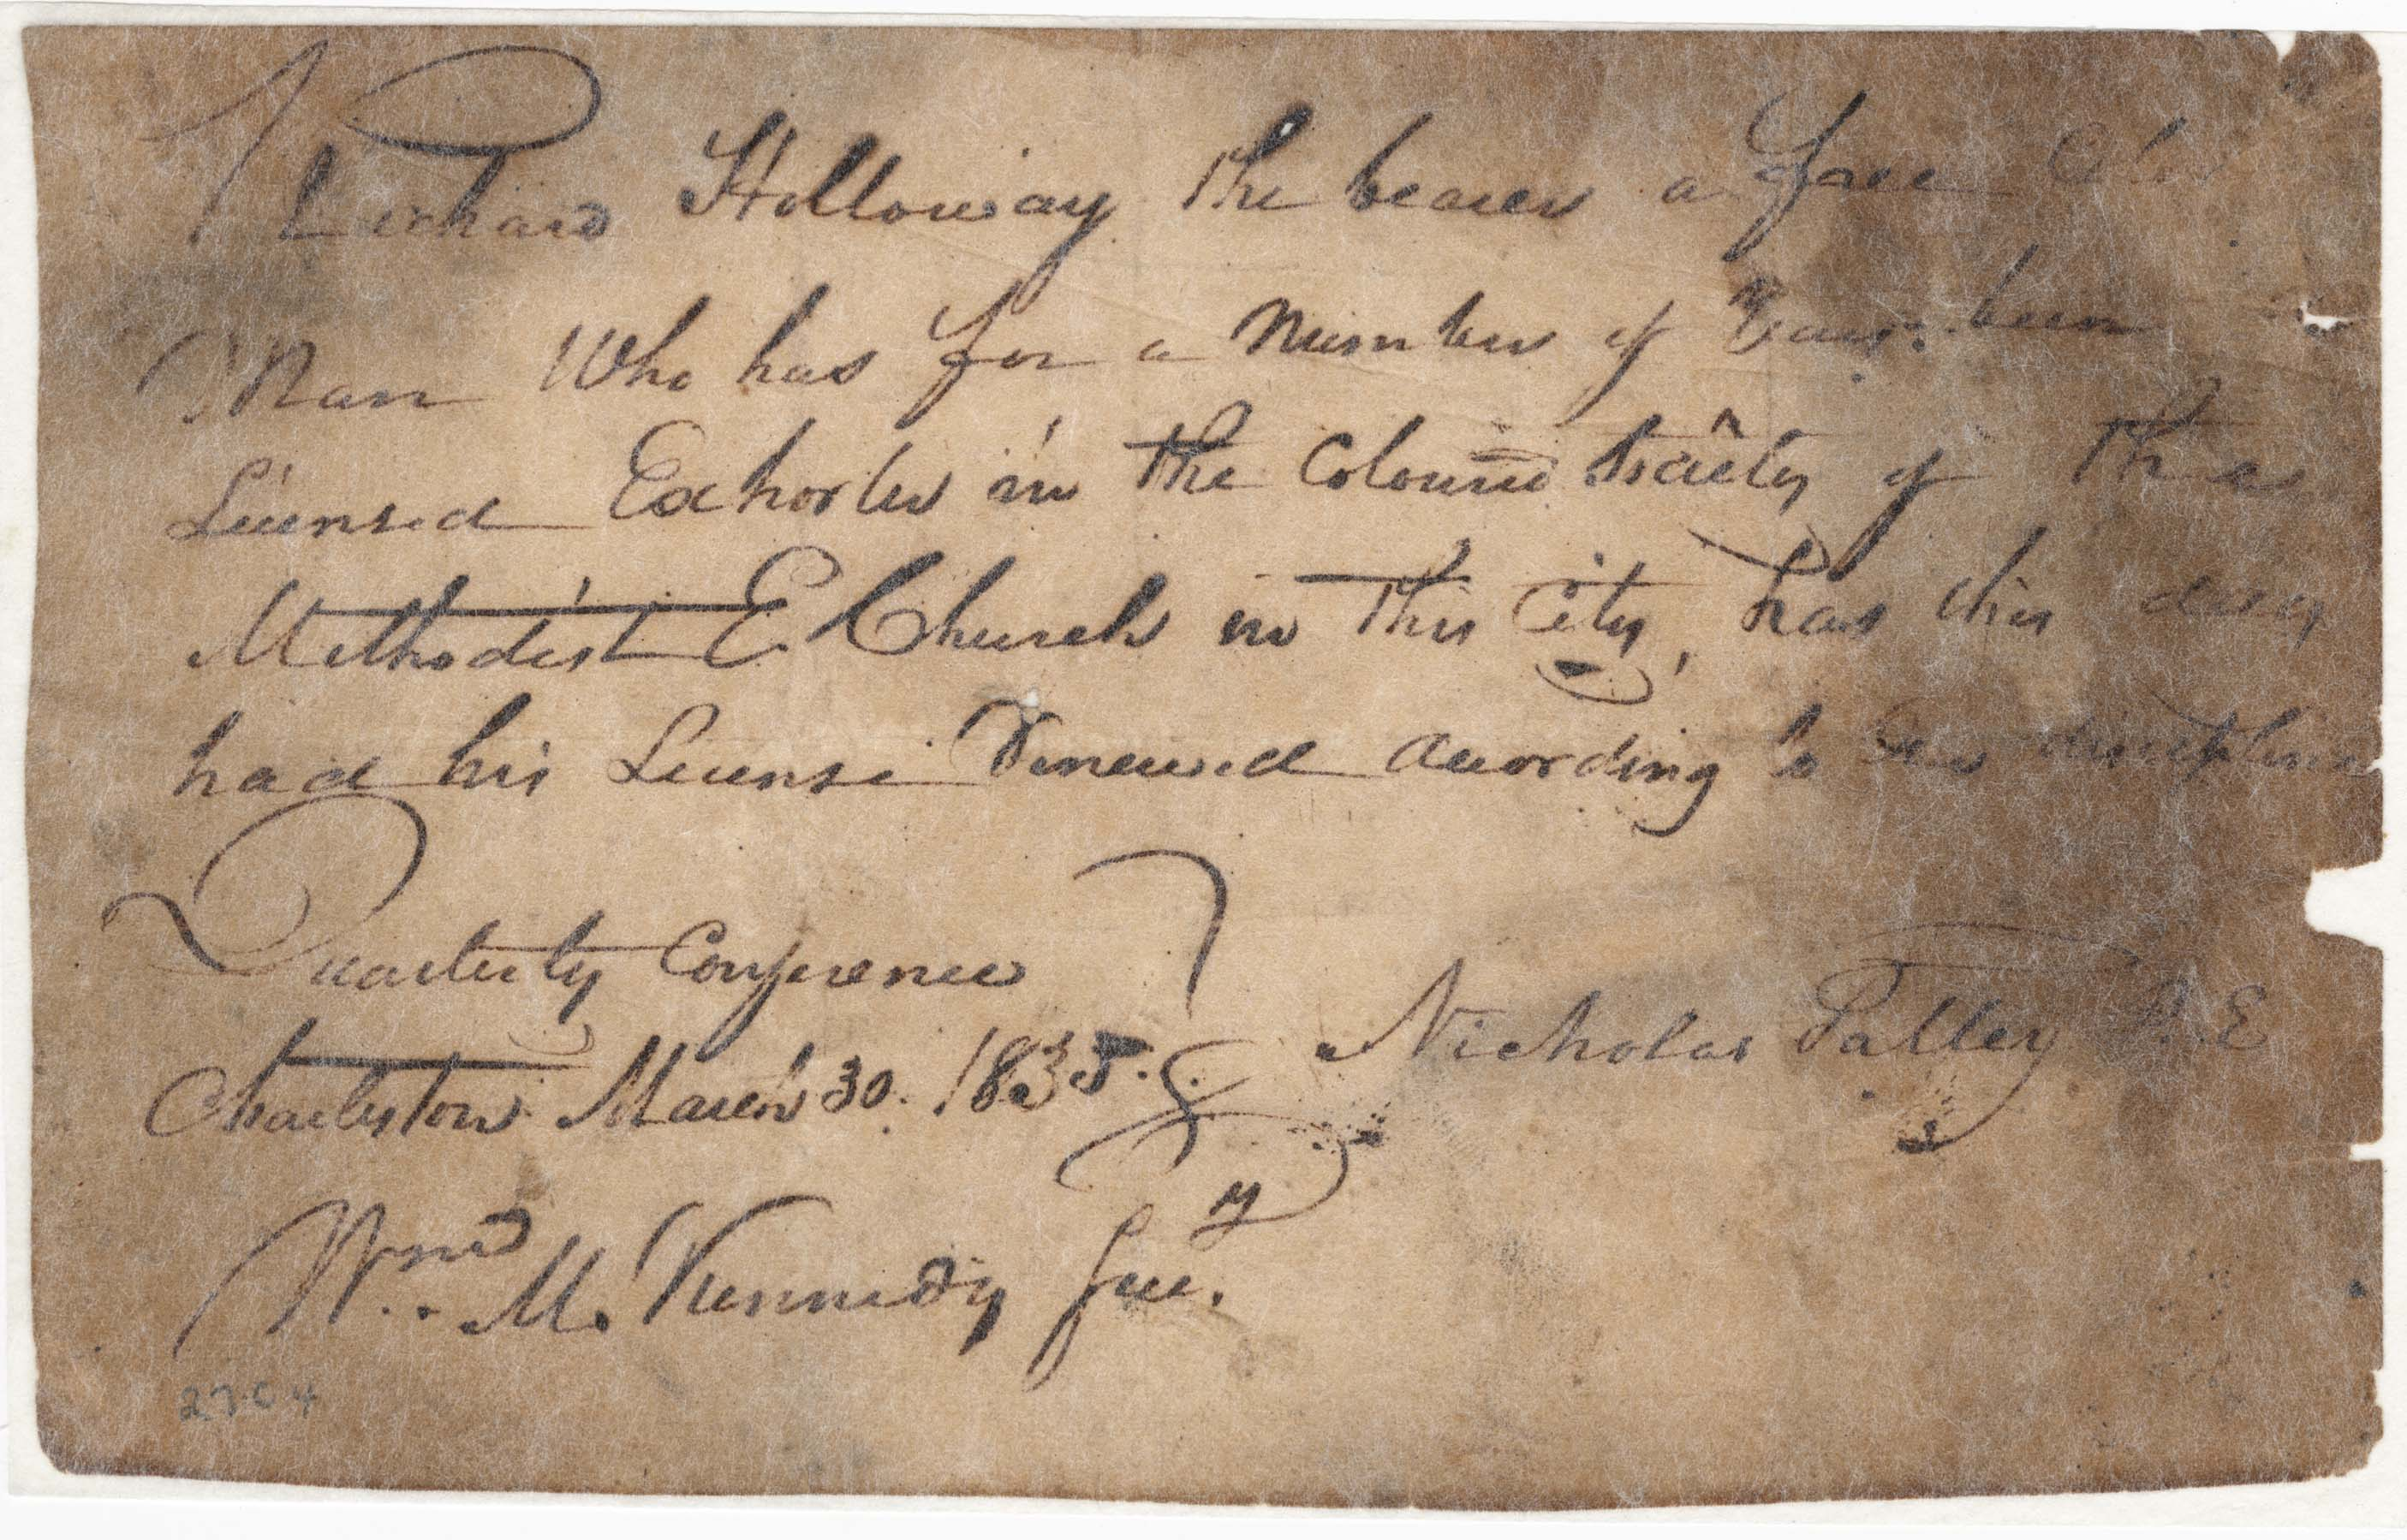 Exhorter license renewal letter (1835)